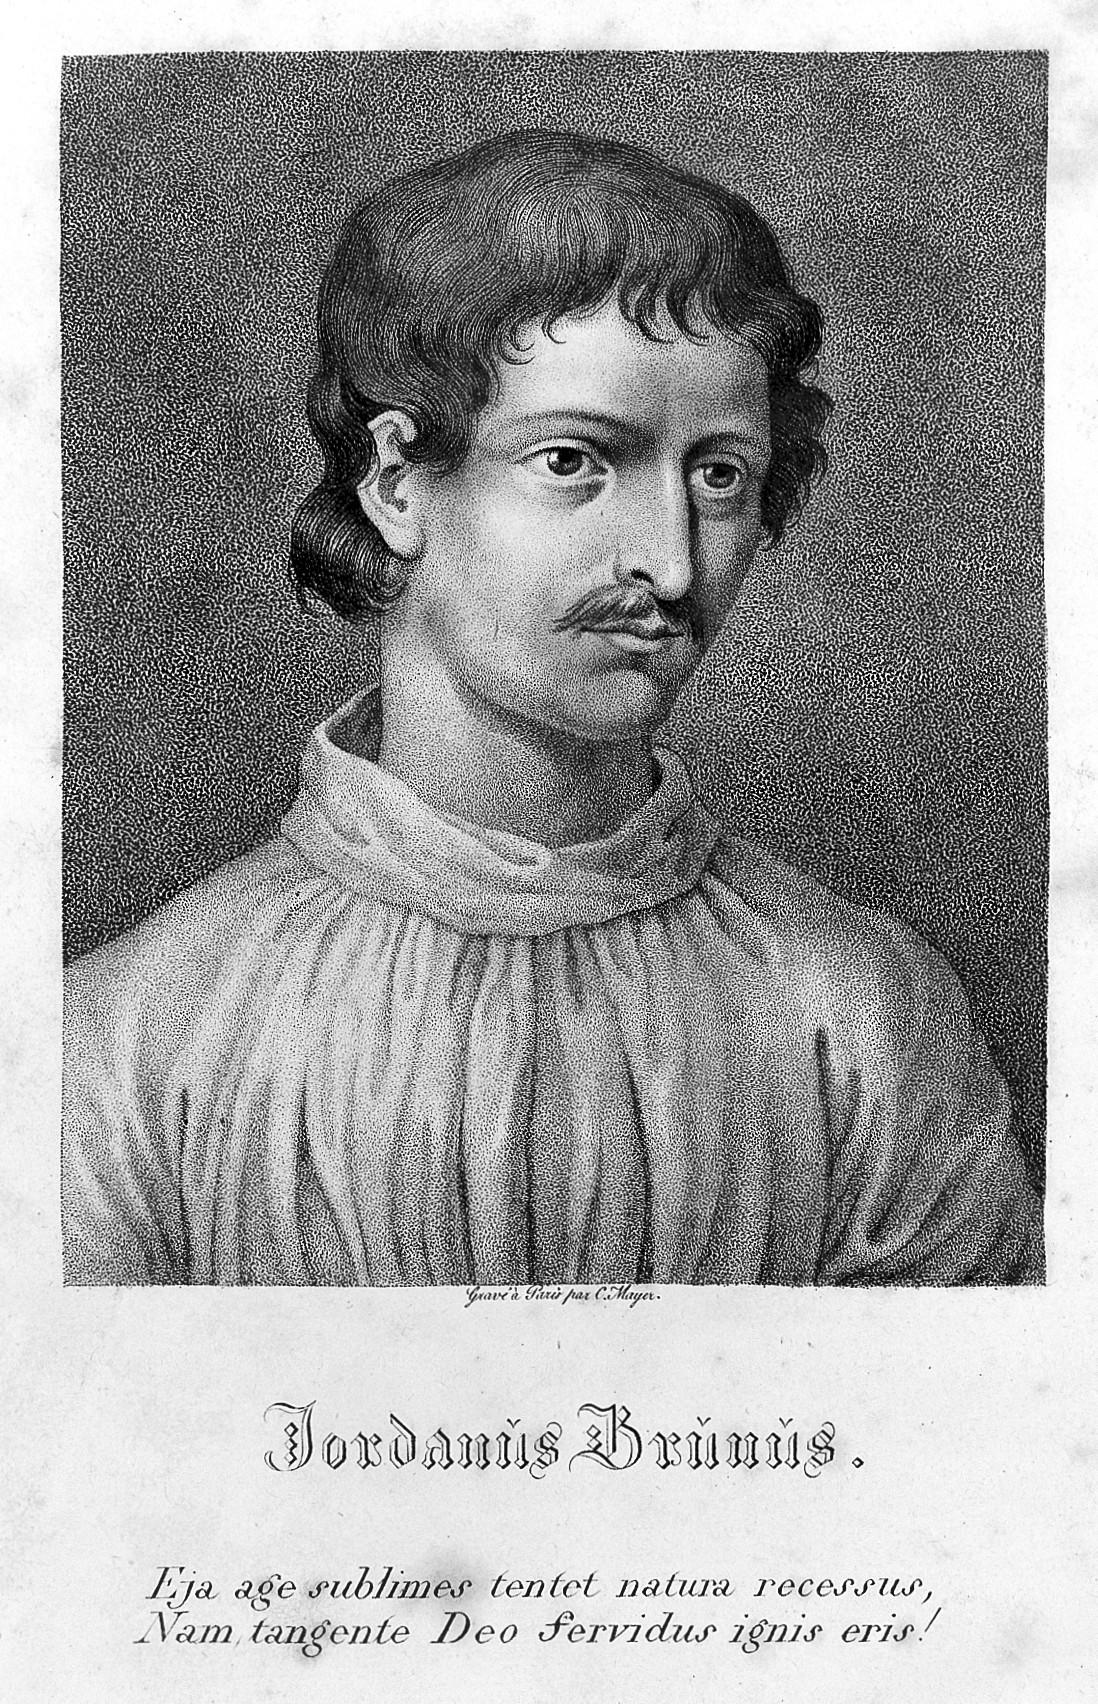 Xhordano Bruno